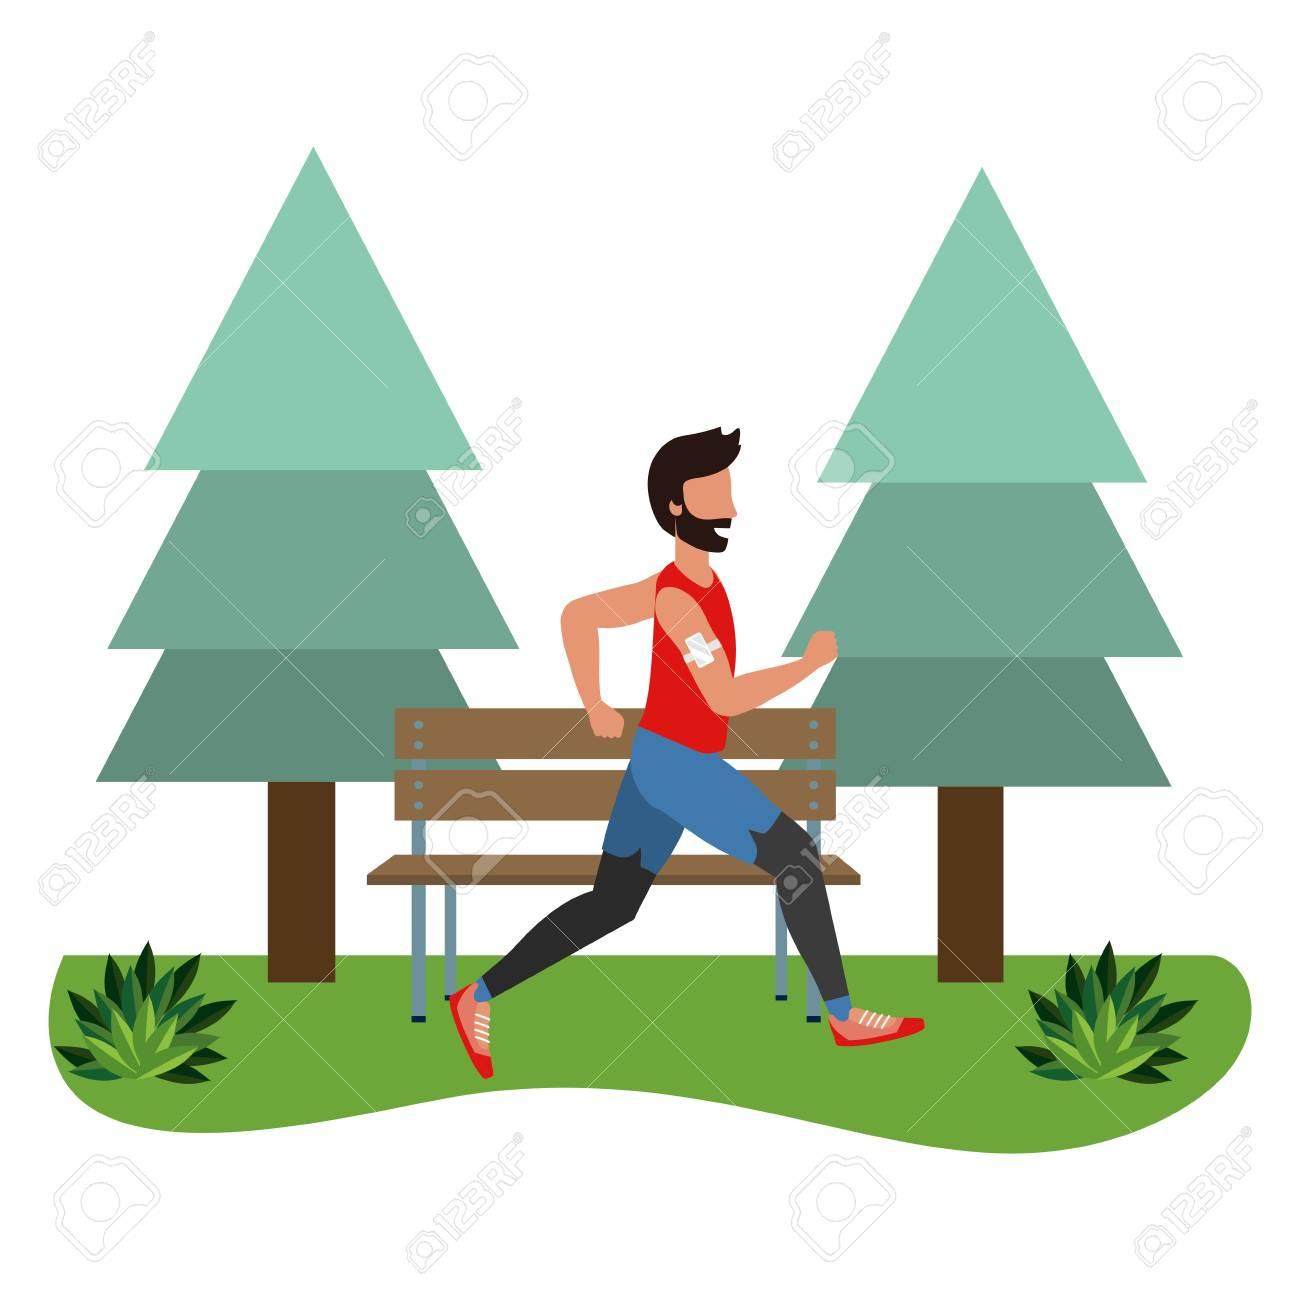 fitness sport train man running outdoor scene cartoon vector illustration graphic design - 122827267